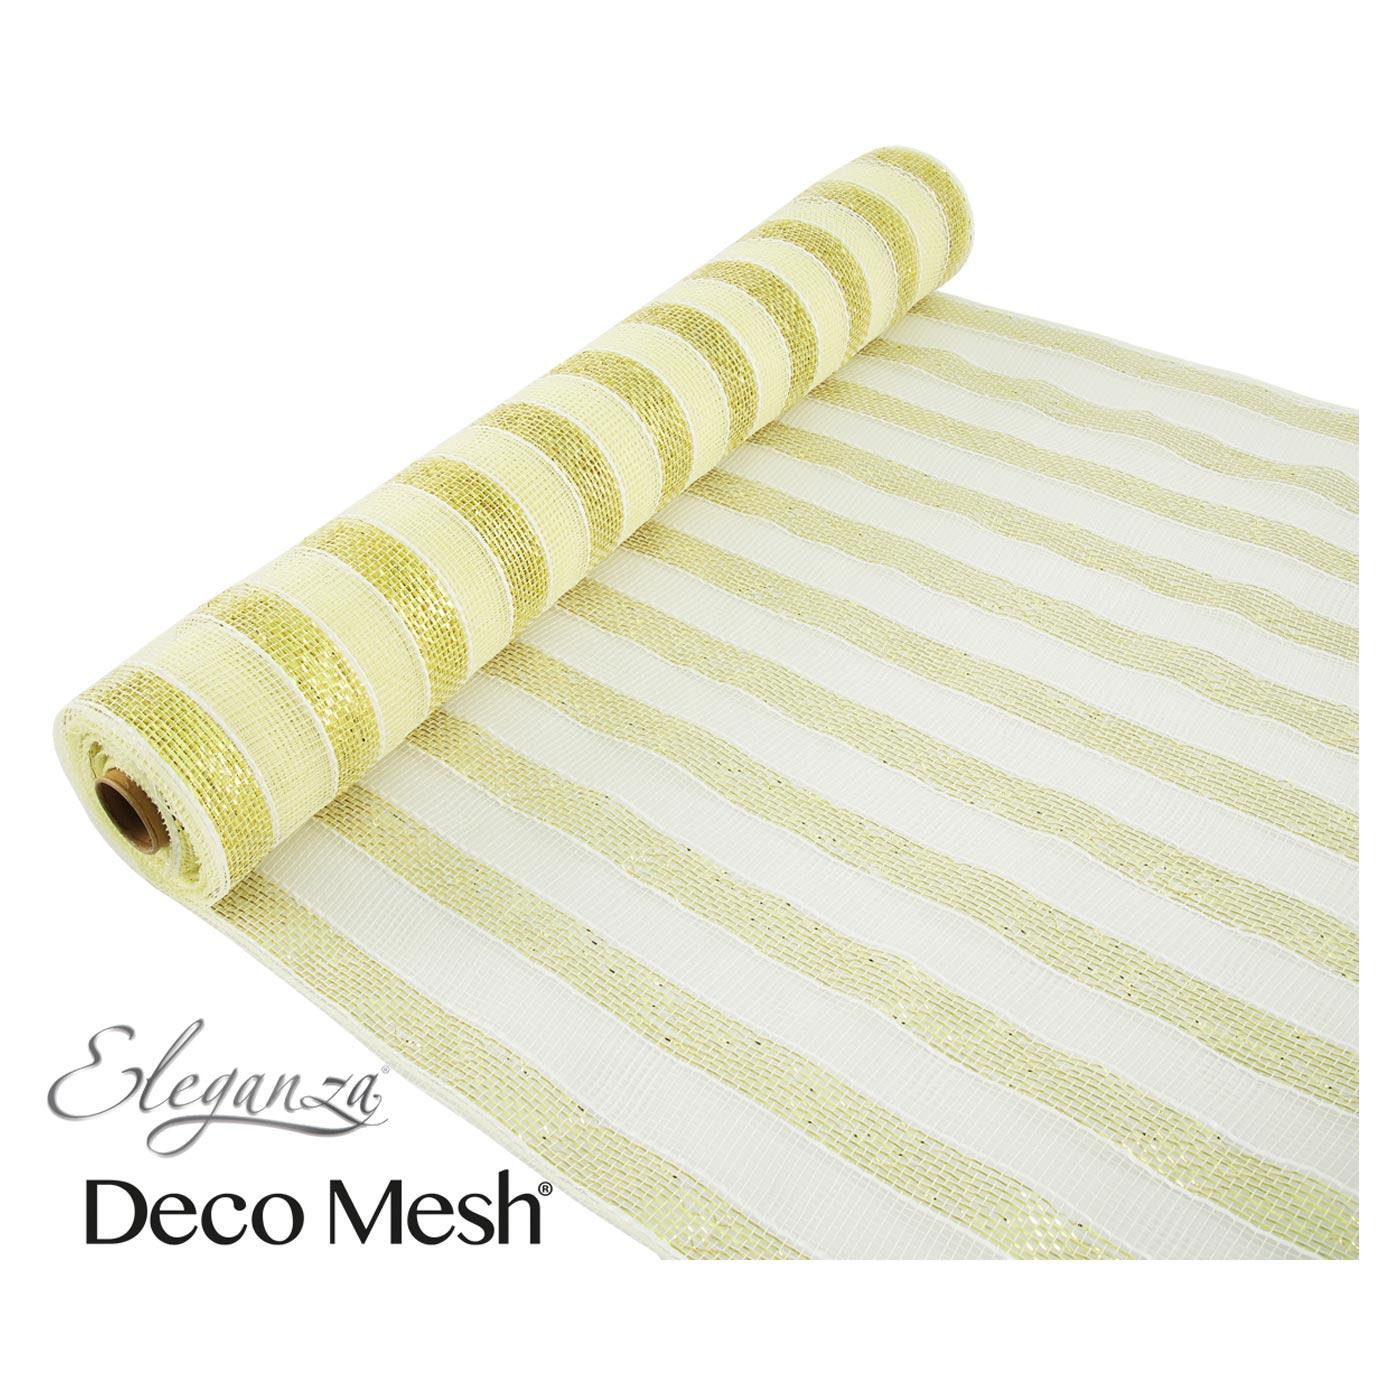 Deco Mesh 53cm Gold Ivory Stripes